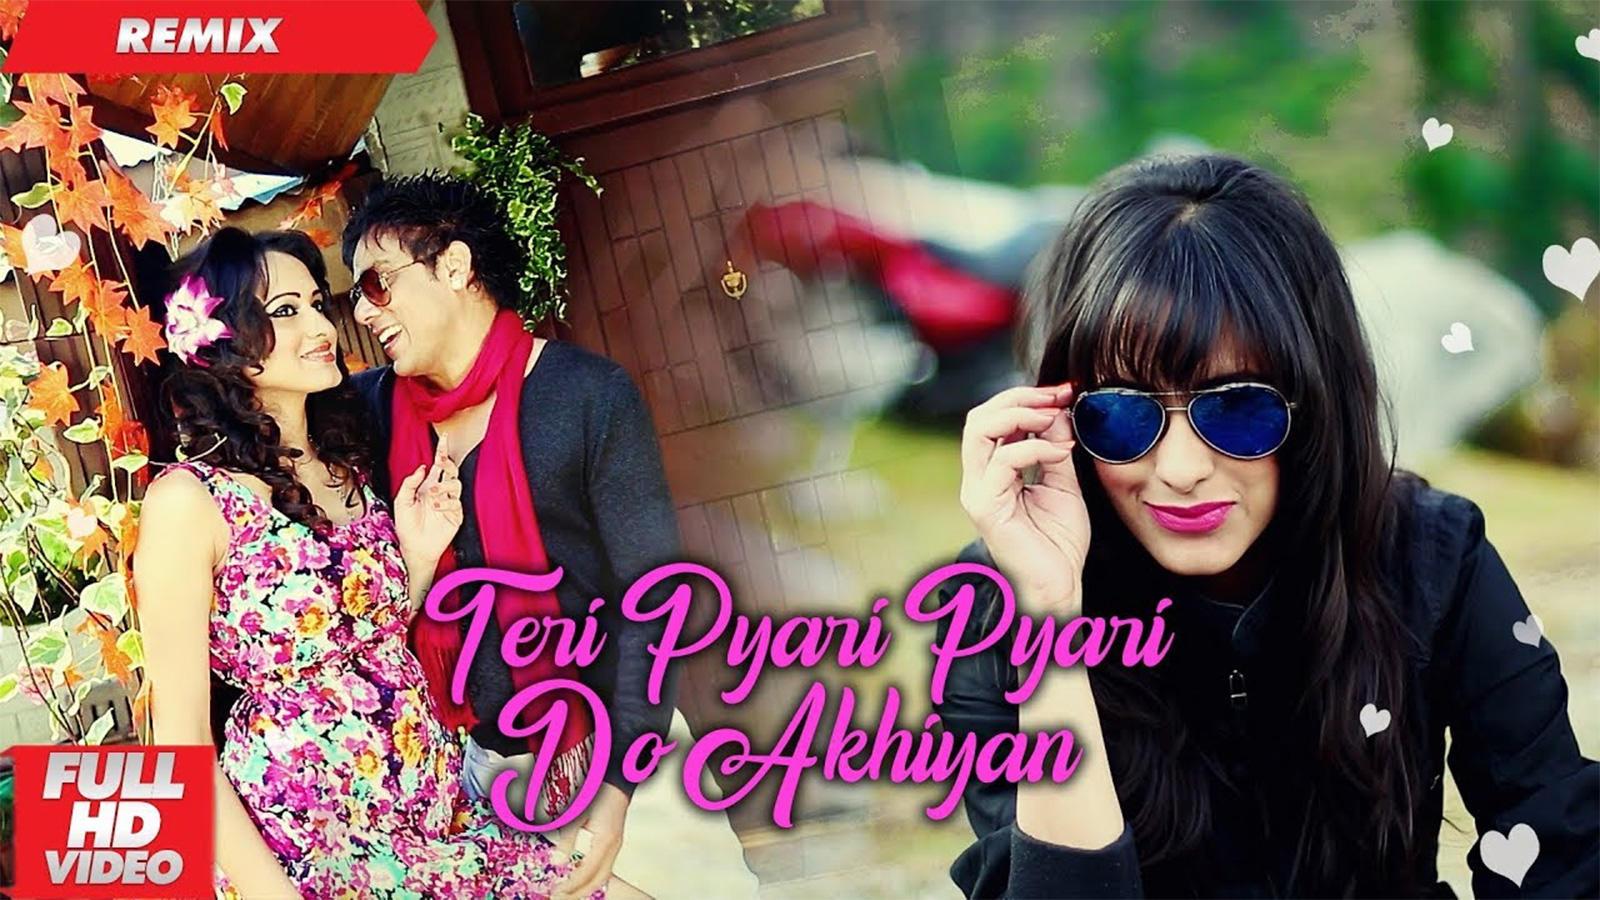 Latest Punjabi Song Teri Pyari Pyari Do Akhiyan Sung By Bhinda Aujla And Bobby Layal Remix Punjabi Video Songs Times Of India